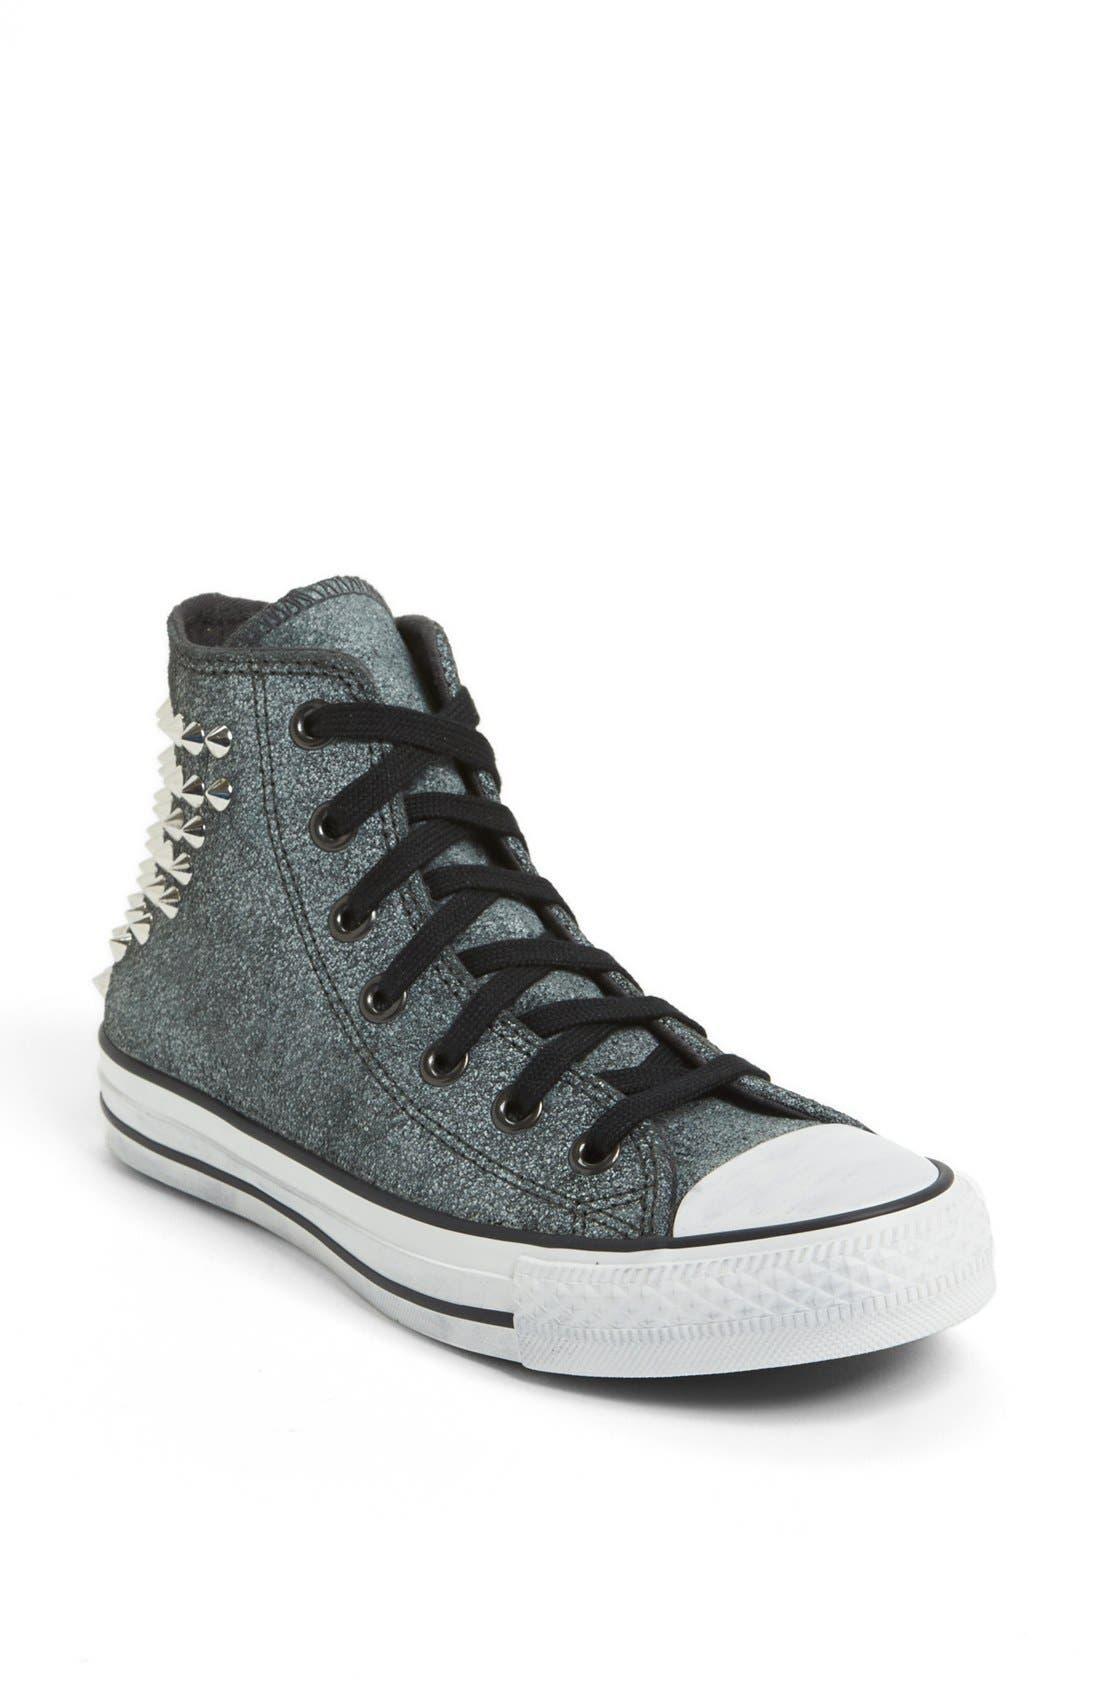 Main Image - Converse Chuck Taylor® All Star® 'Collar Studs' High Top Sneaker (Women)